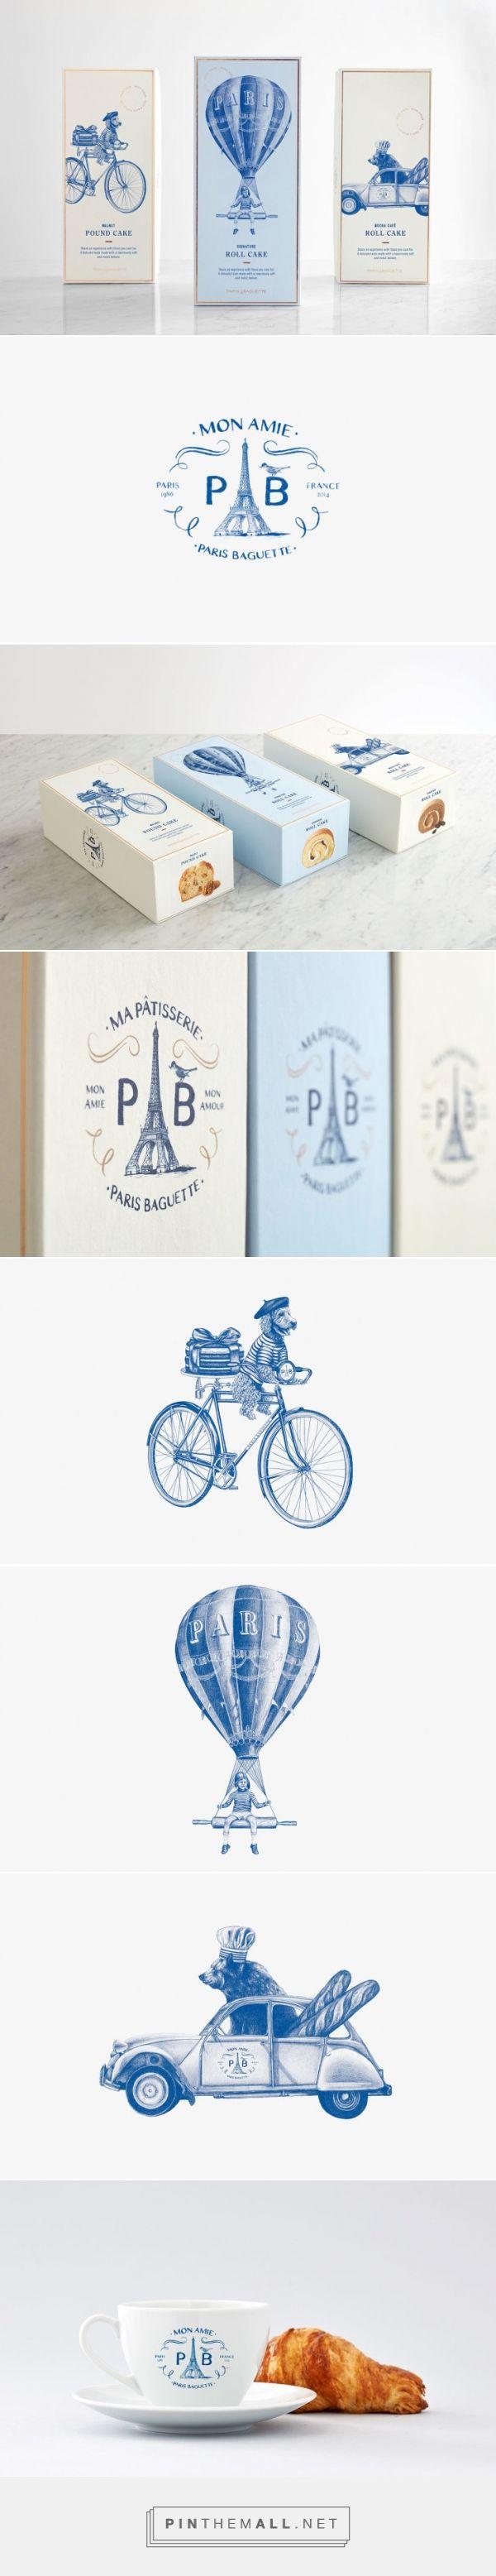 Paris Baguette                                                                                                                                                                                 Plus                                                                                                                                                                                 Plus